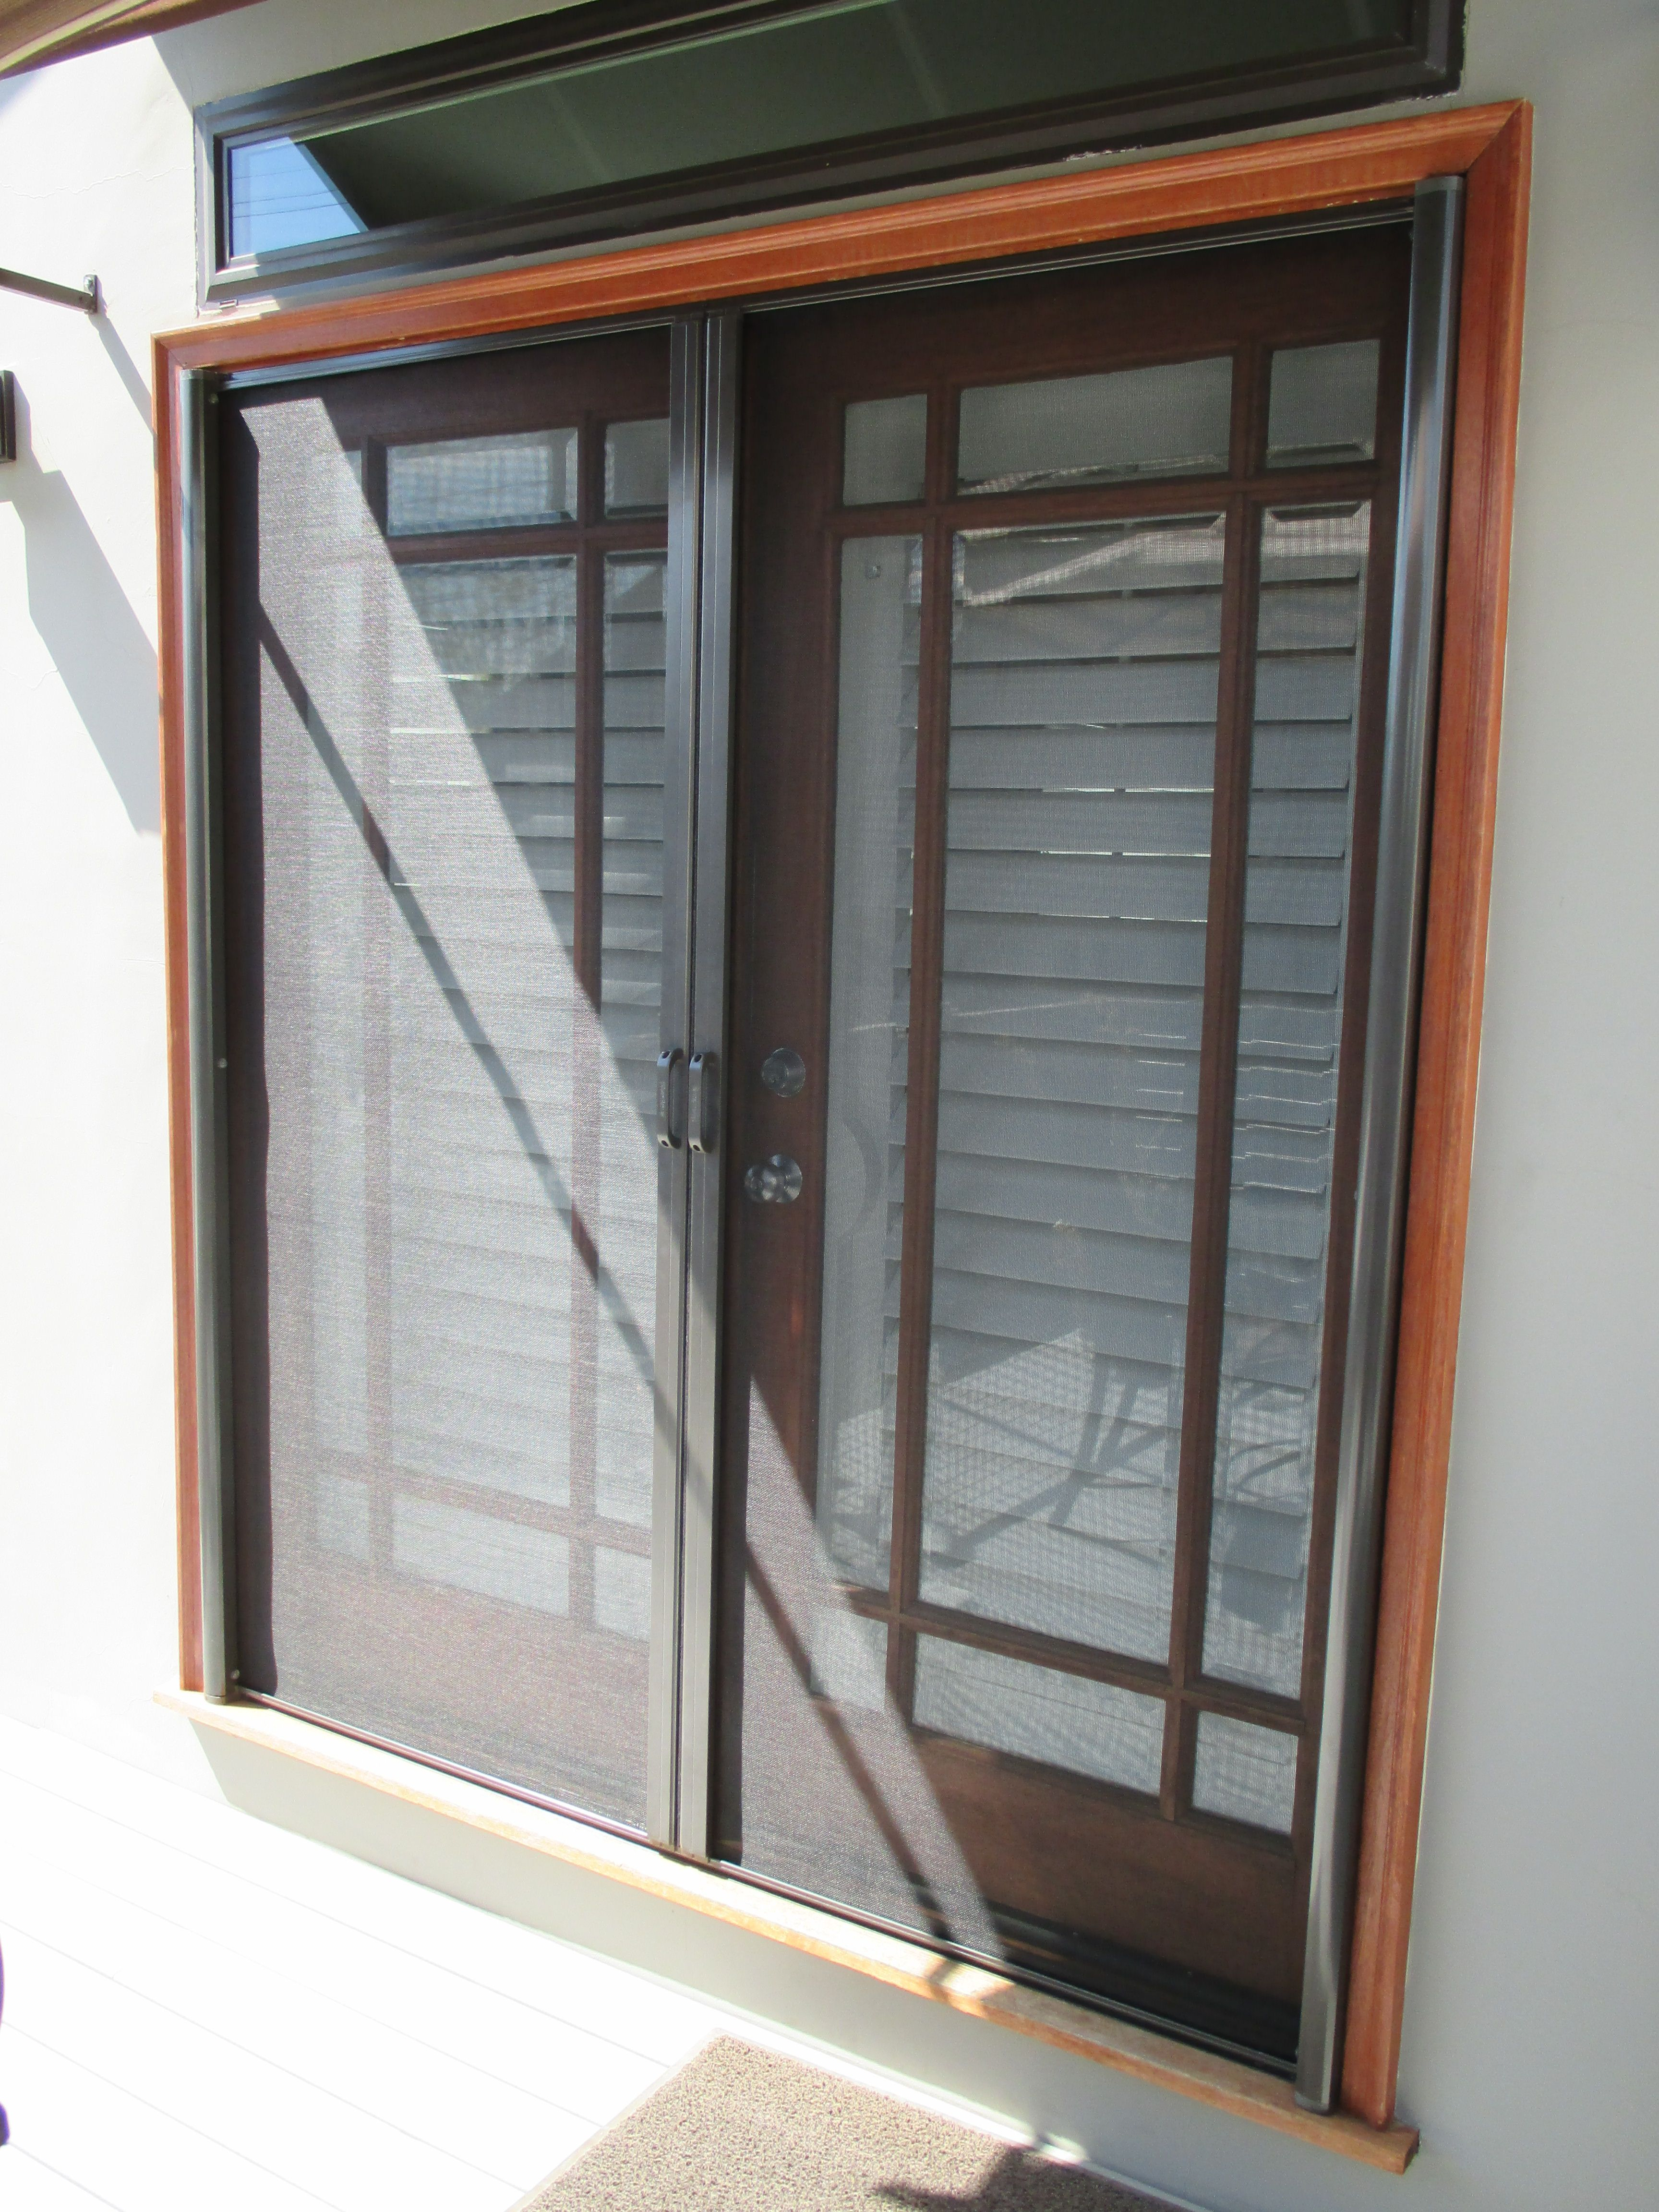 Double Door Retractable Stowaway Screen Installed On These Beautiful French Doors In Orange County California